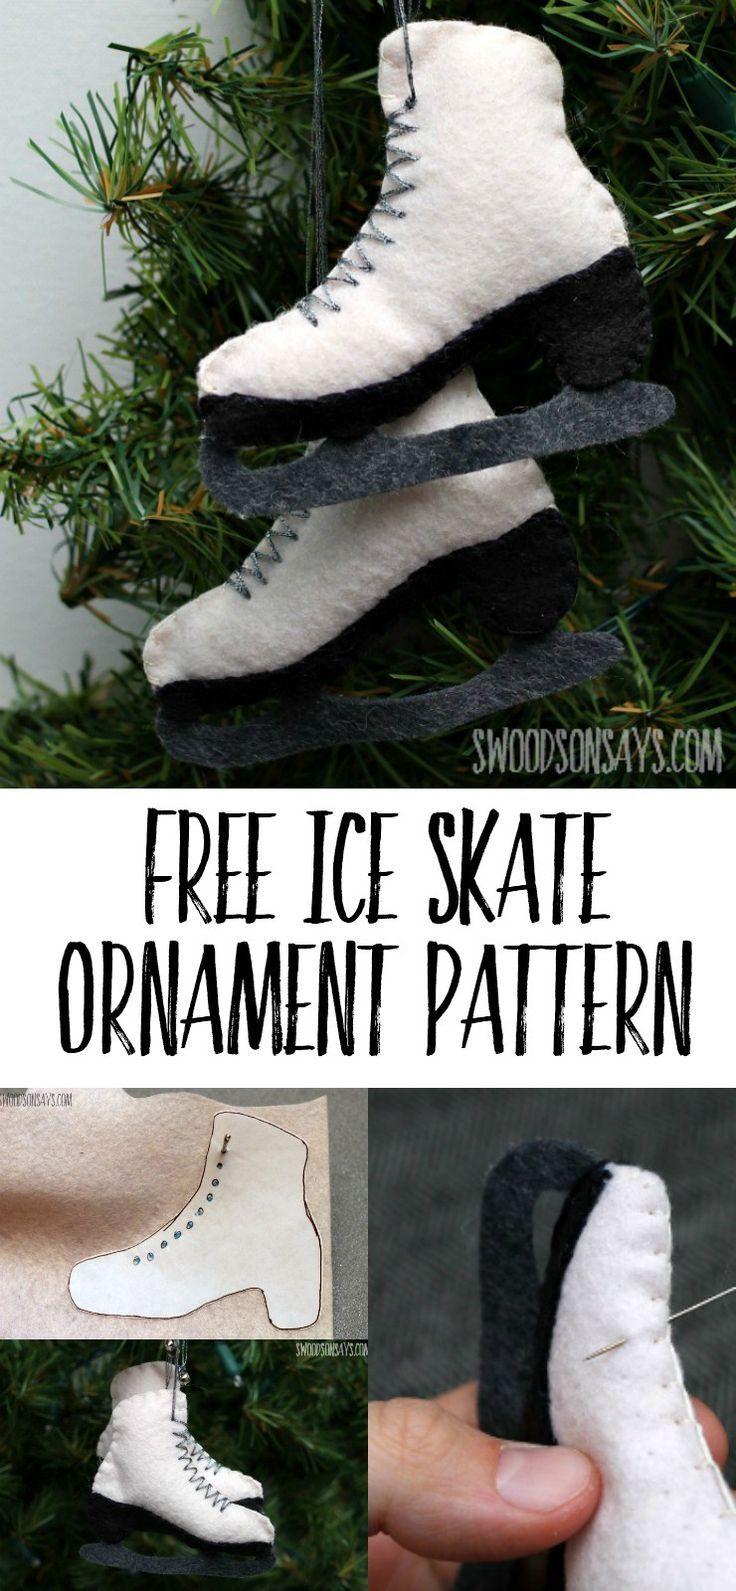 A free felt ice skate ornament pattern